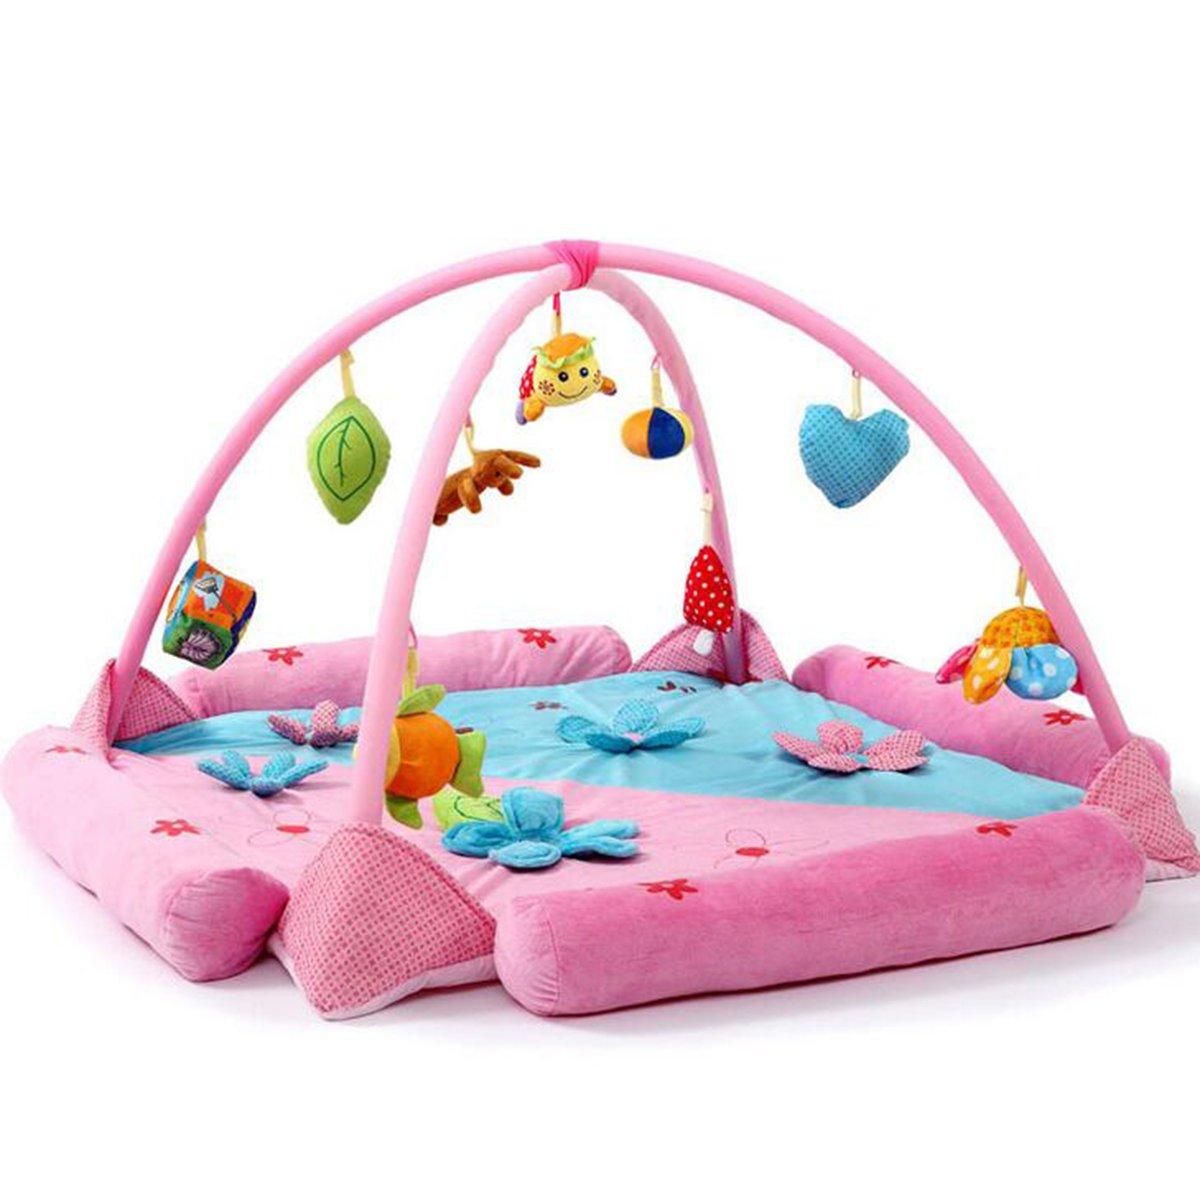 Guurachi Softly Flower Multi-Activity Playmat & Gym Baby Toy